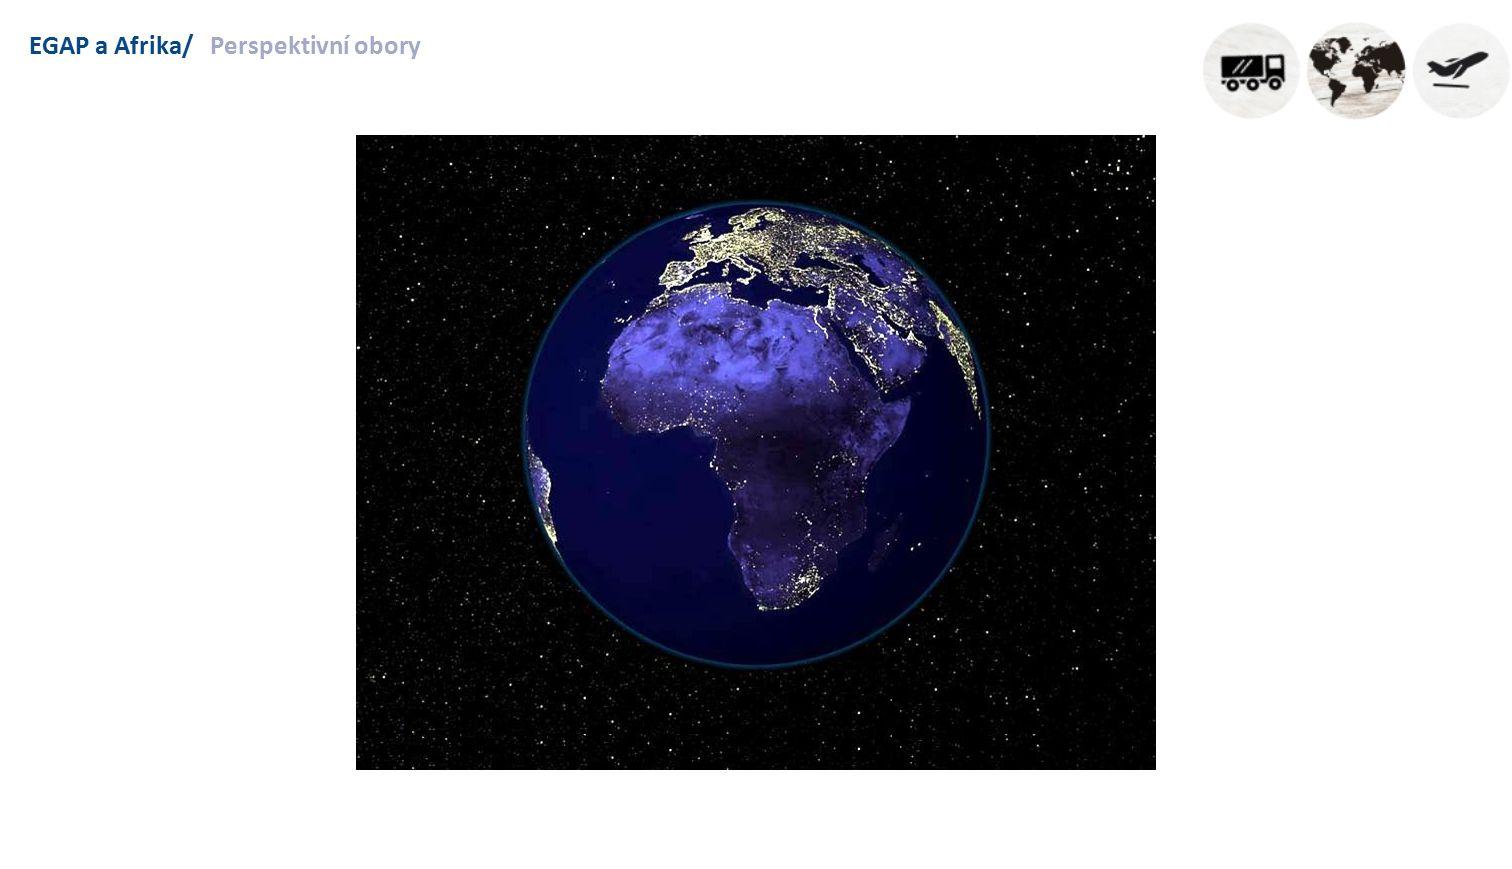 EGAP a Afrika/Perspektivní obory